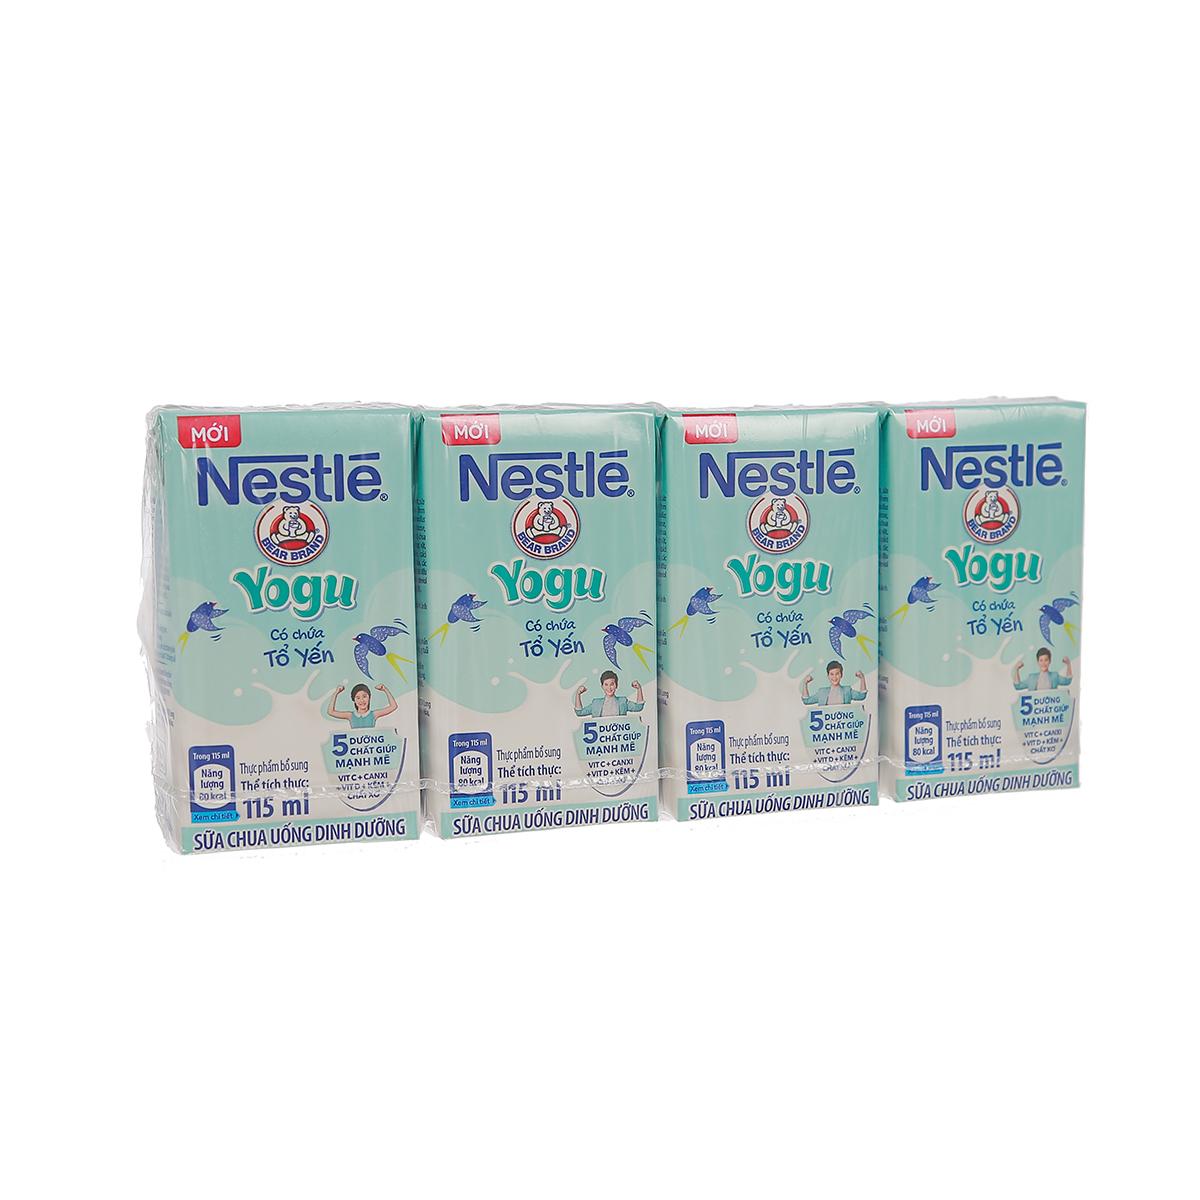 Sữa chua uống Nestl'e Yogu (4x115ml) cho bé trên 1 tuổi